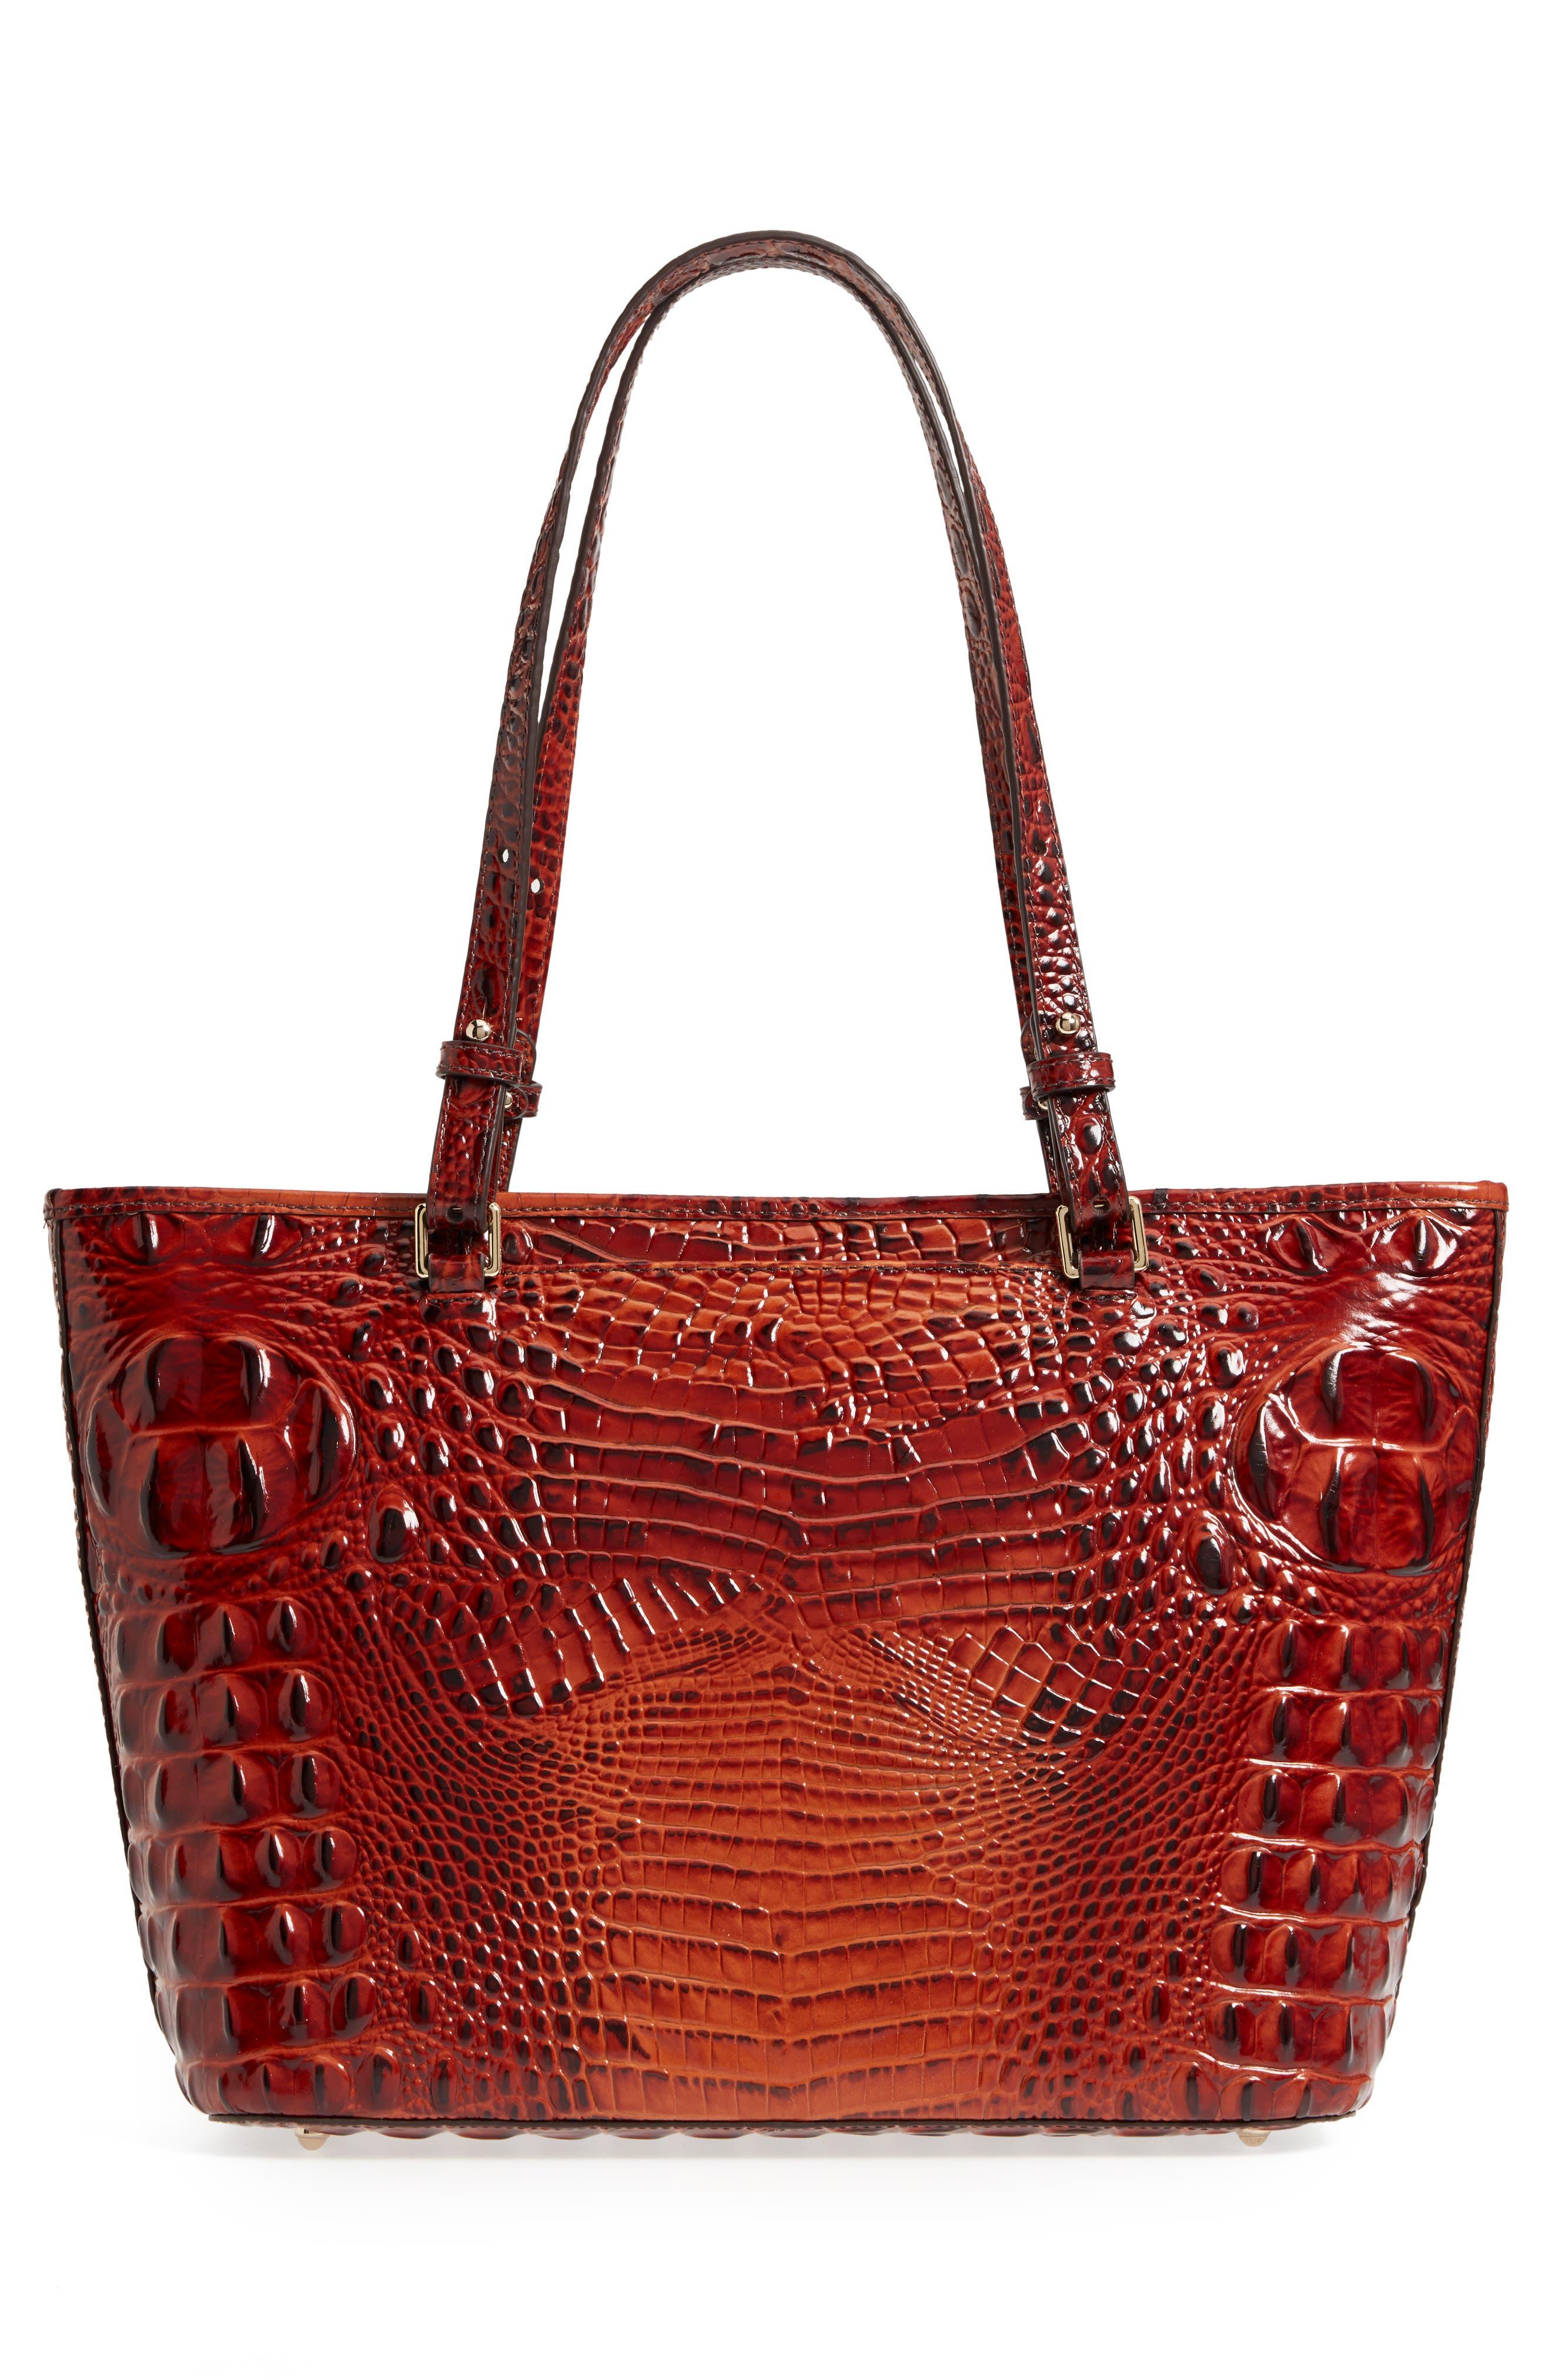 Medium Asher Leather Tote Bag,                             Alternate thumbnail 3, color,                             Pecan